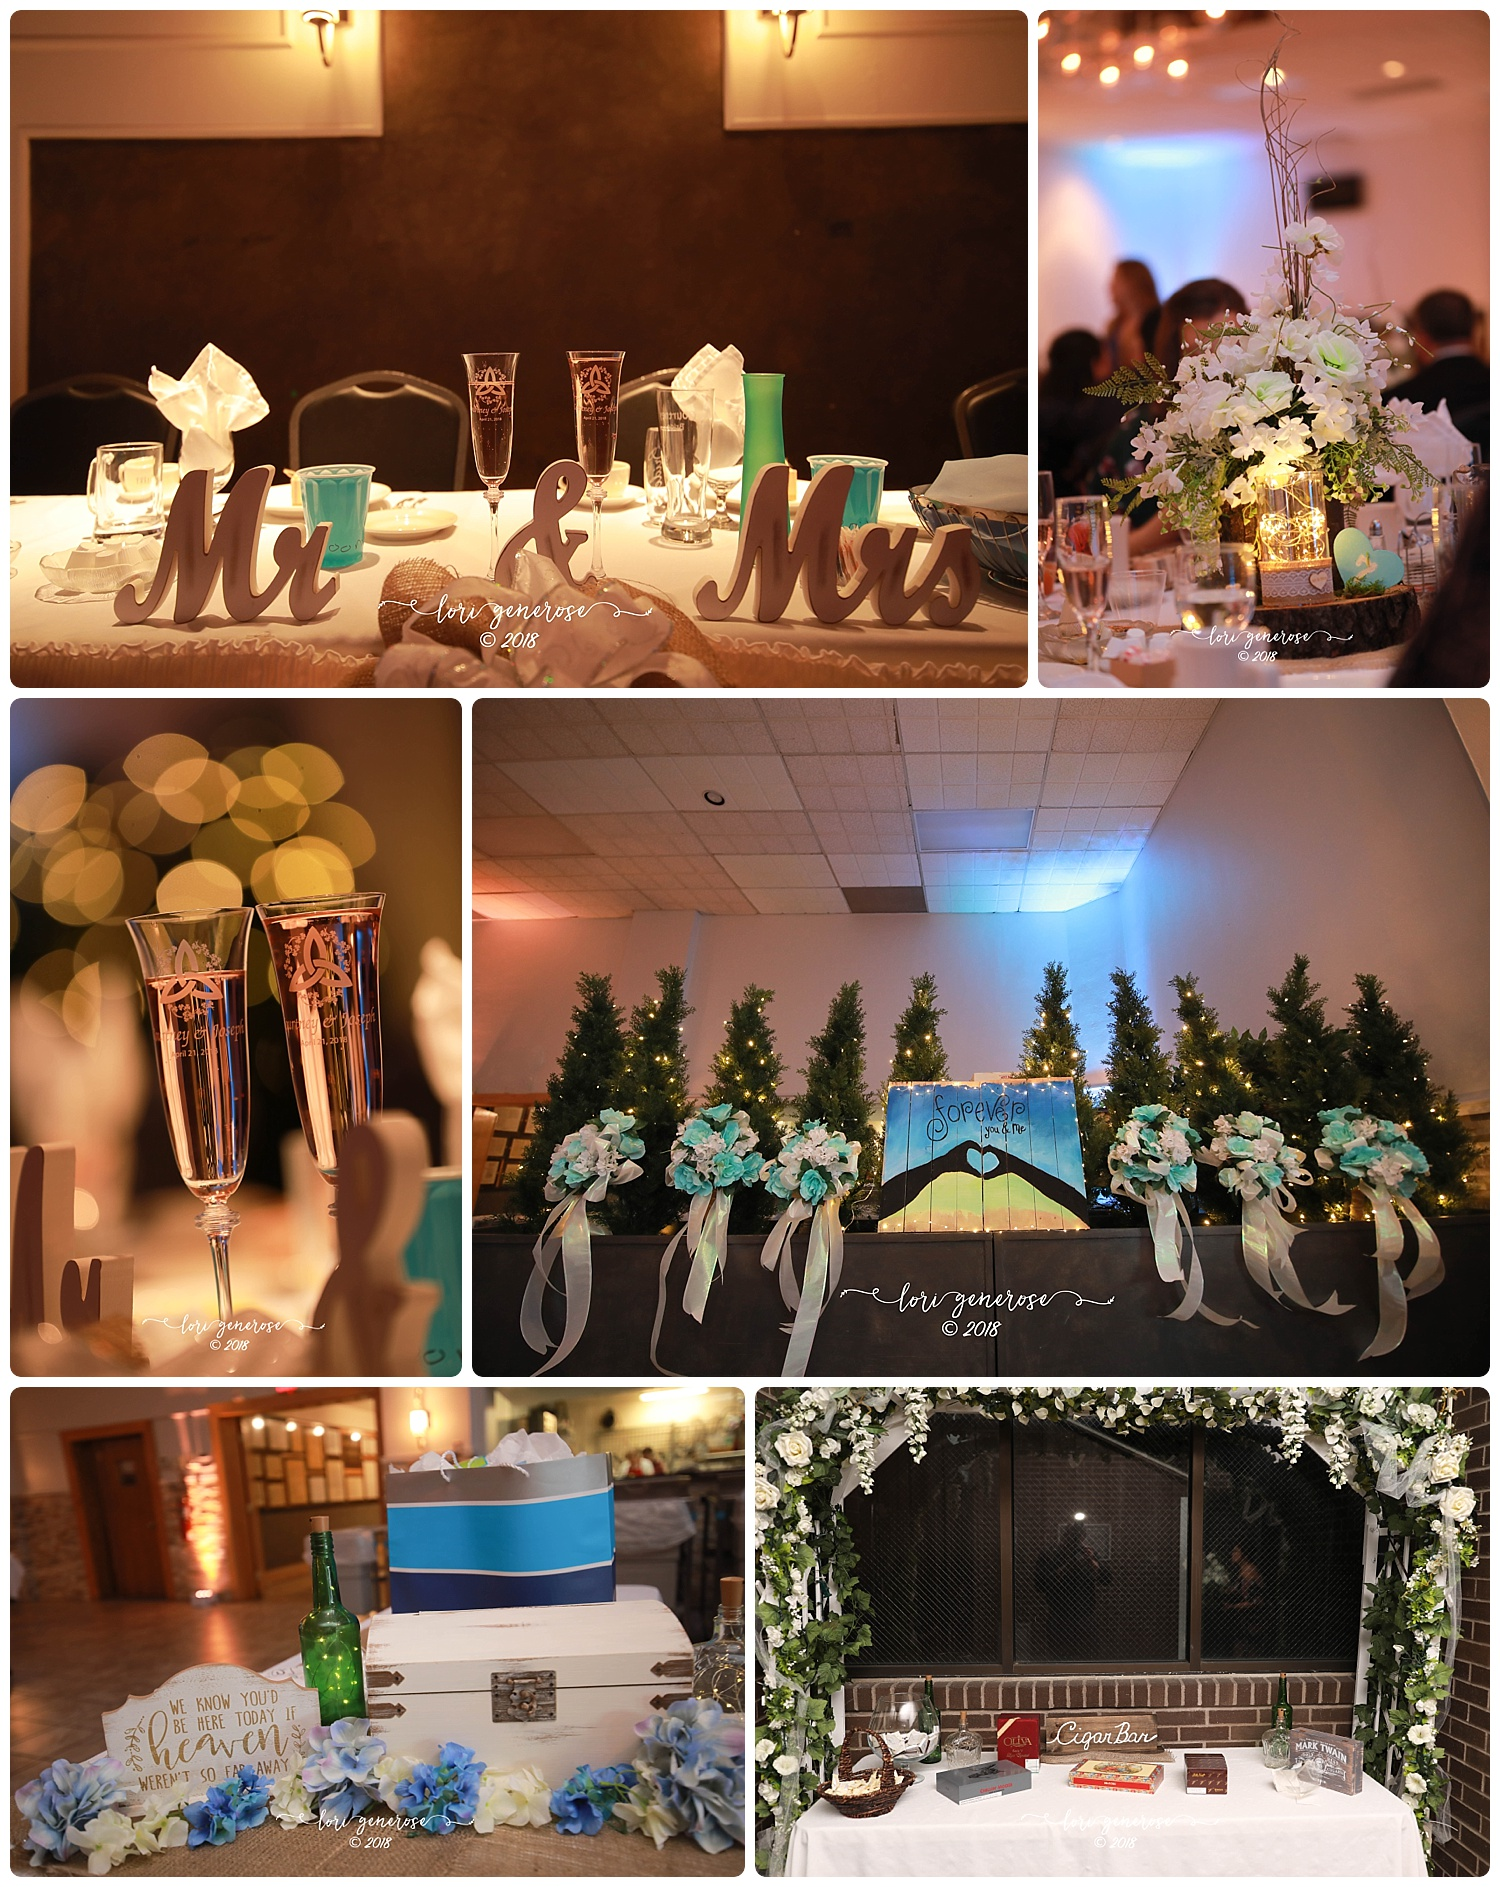 weddingreceptiondetailscenterpiecesatnorthamptoncommunitycenternorthamptonpalgphotography.jpg